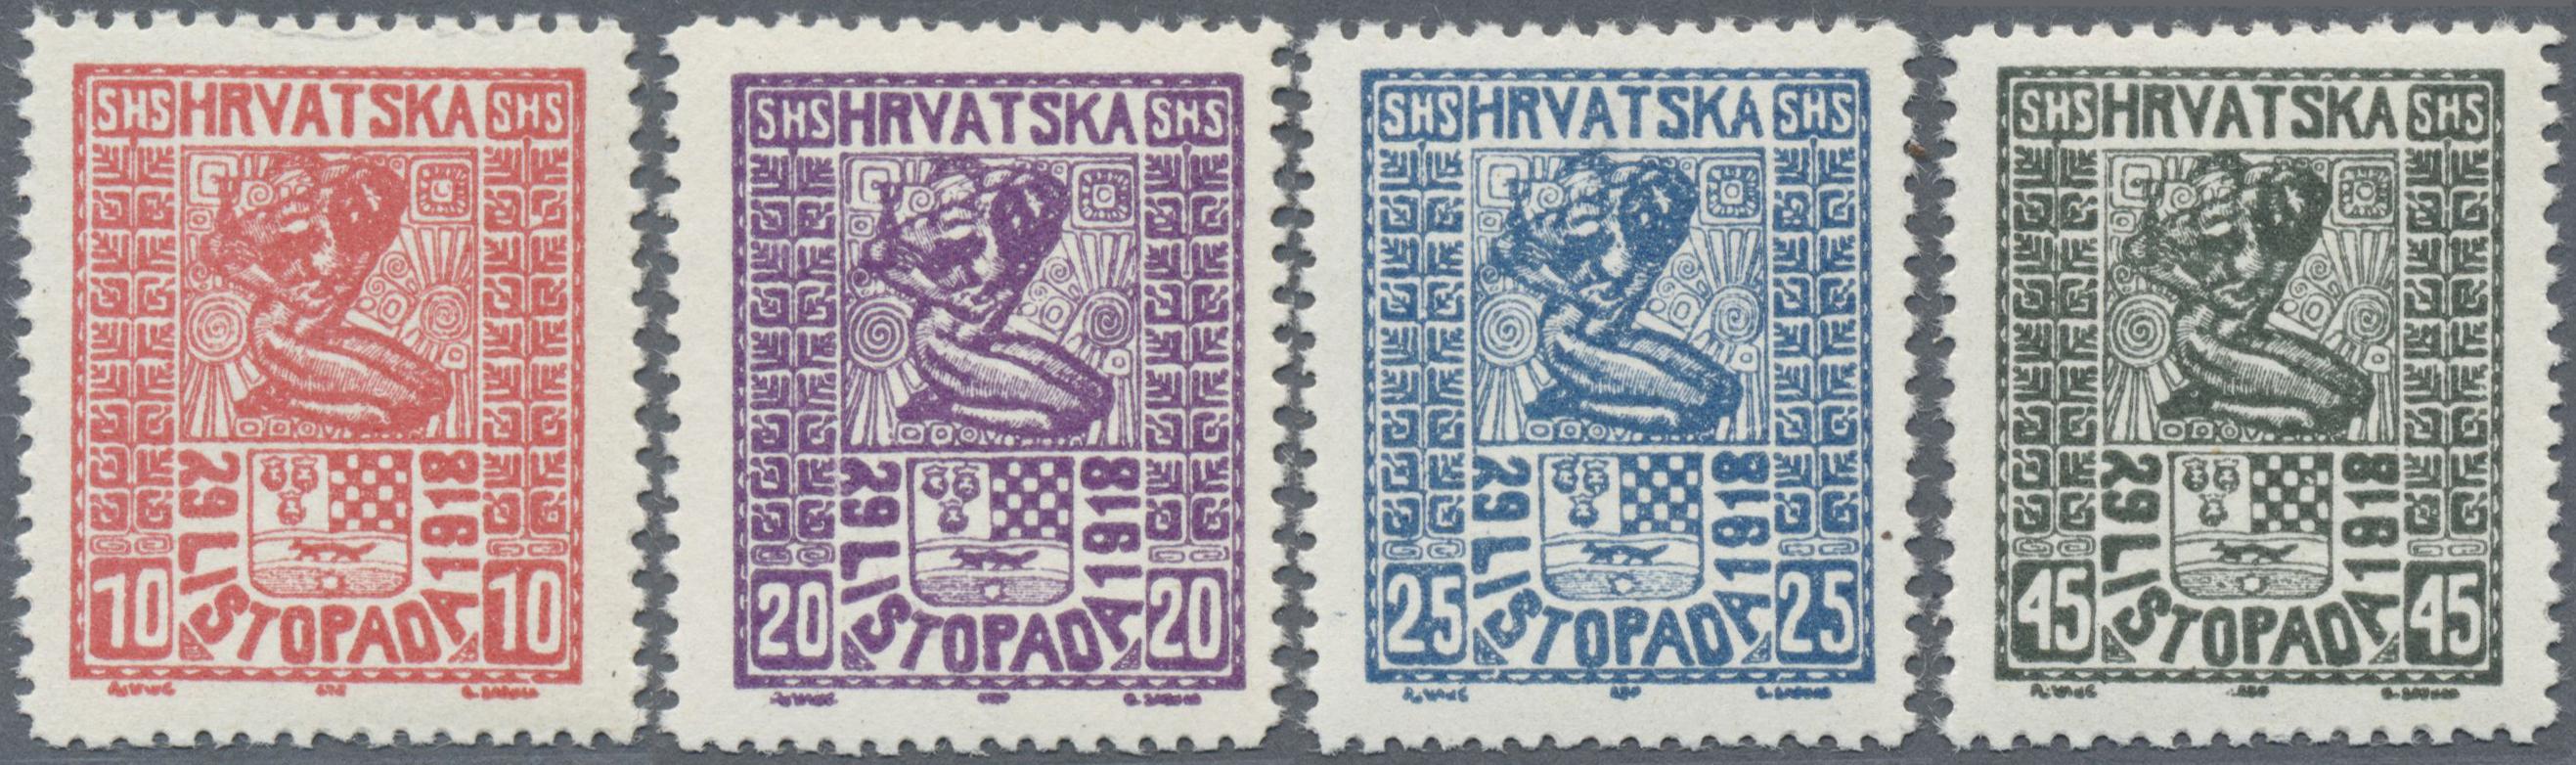 Lot 17231 - jugoslawien  -  Auktionshaus Christoph Gärtner GmbH & Co. KG Single lots Philately Overseas & Europe. Auction #39 Day 4